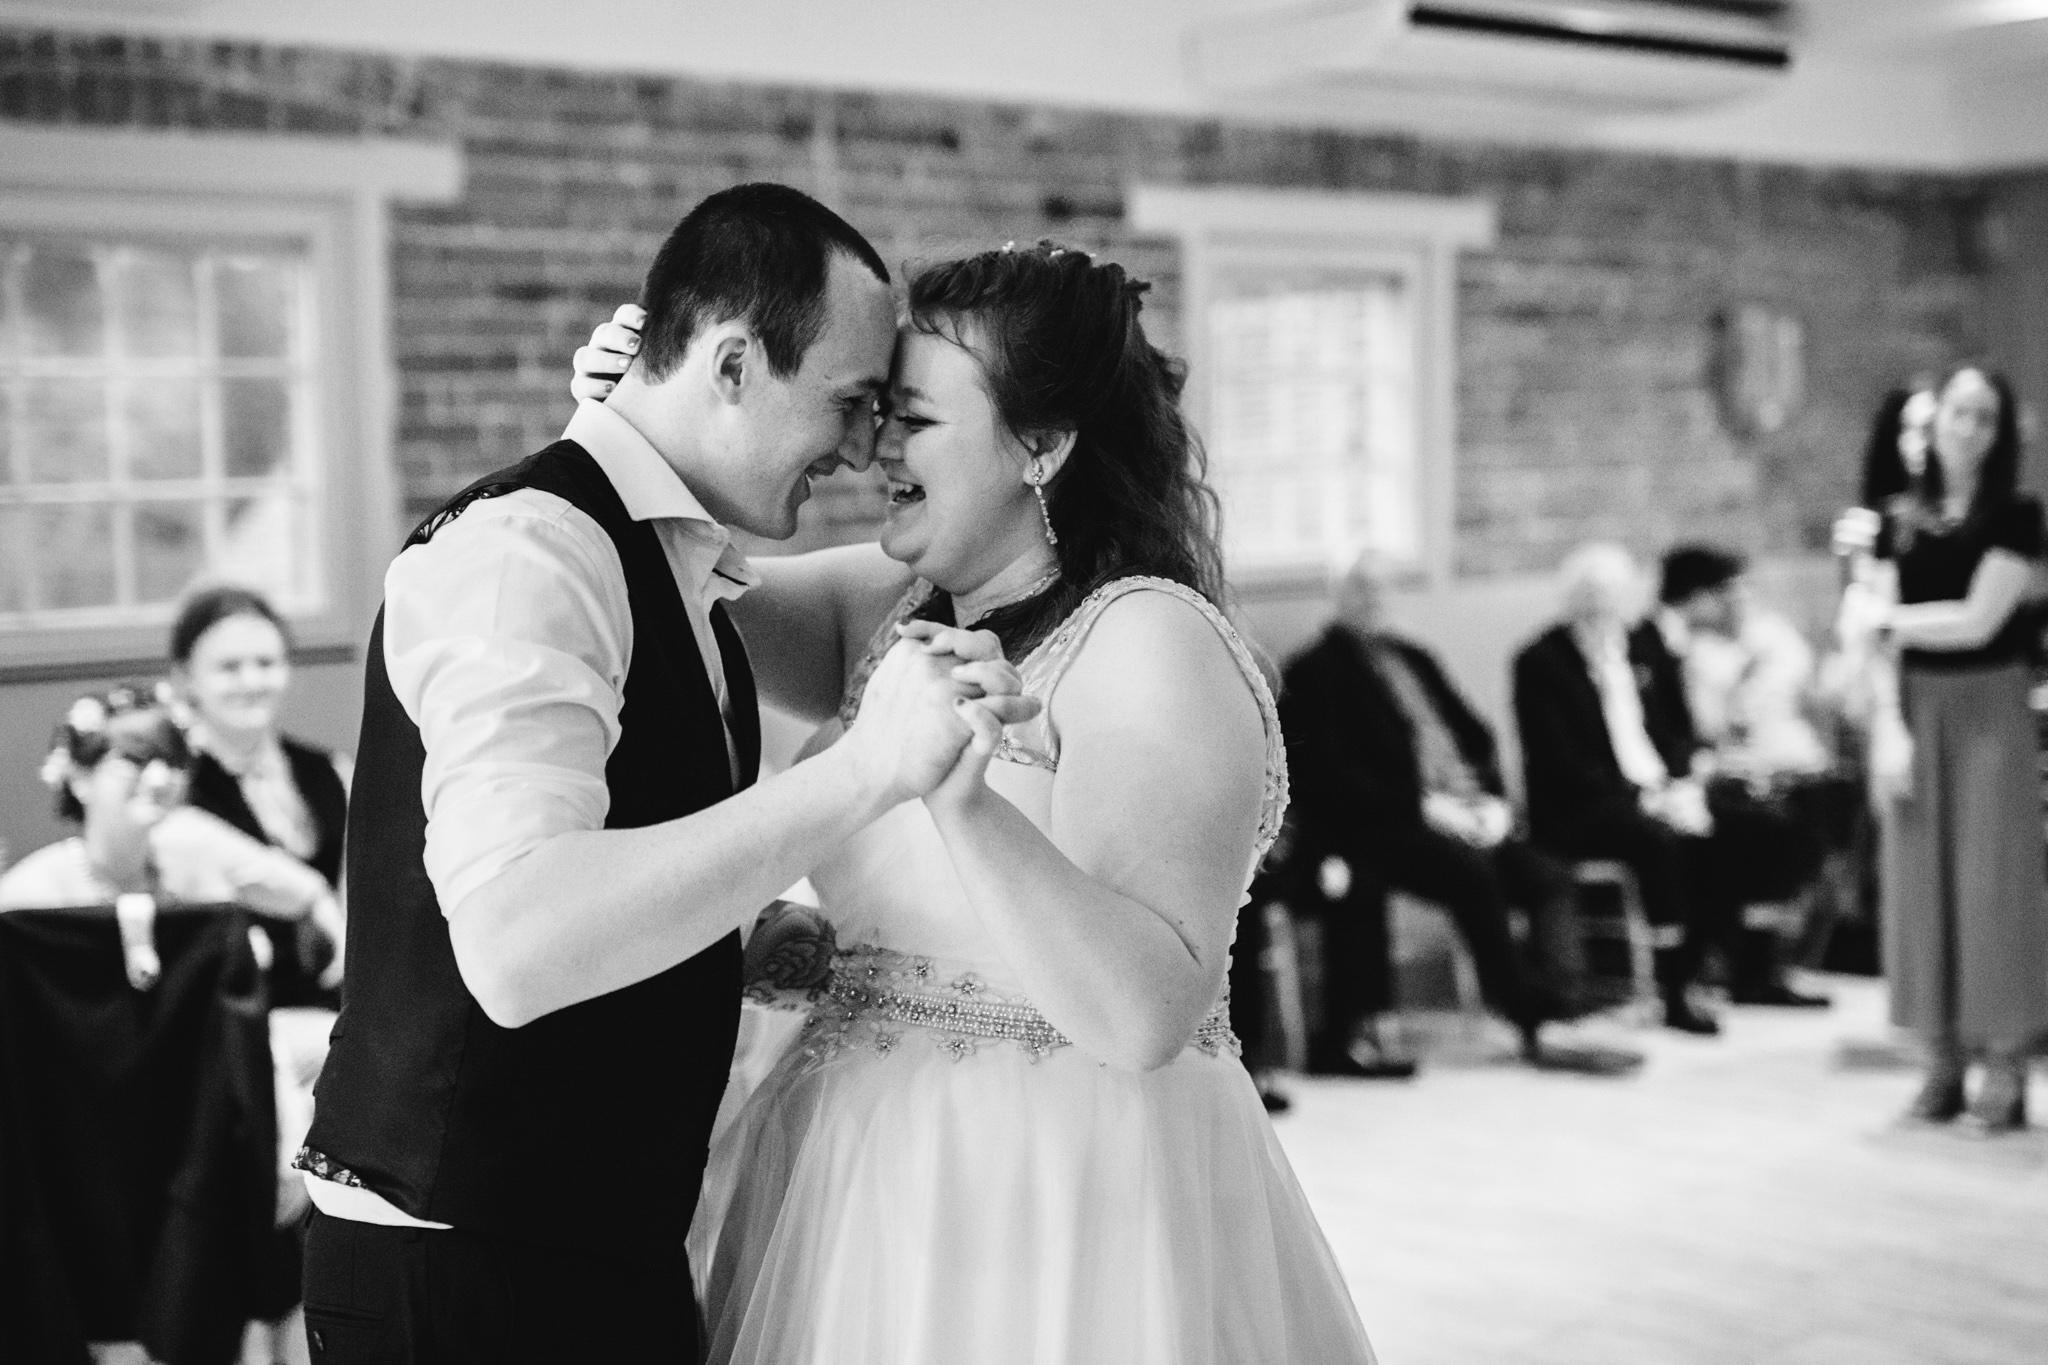 derbyshire-wedding-photographer-march-april-73.jpg